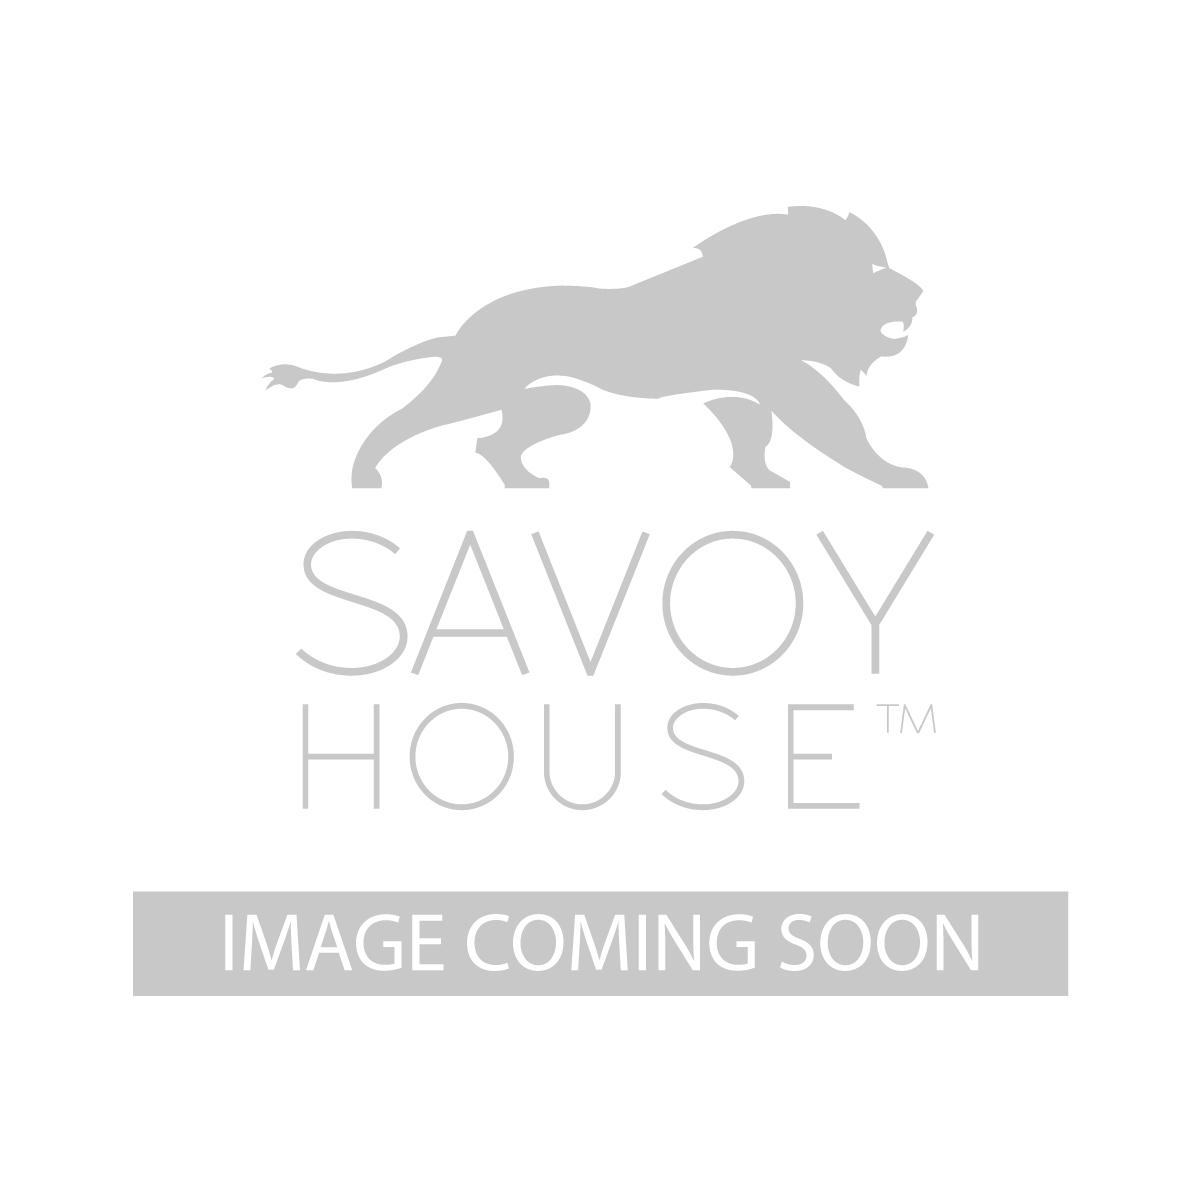 3 8040 4 79 kirkland 4 light foyer pendant by savoy house kirkland 4 light foyer pendant aloadofball Gallery